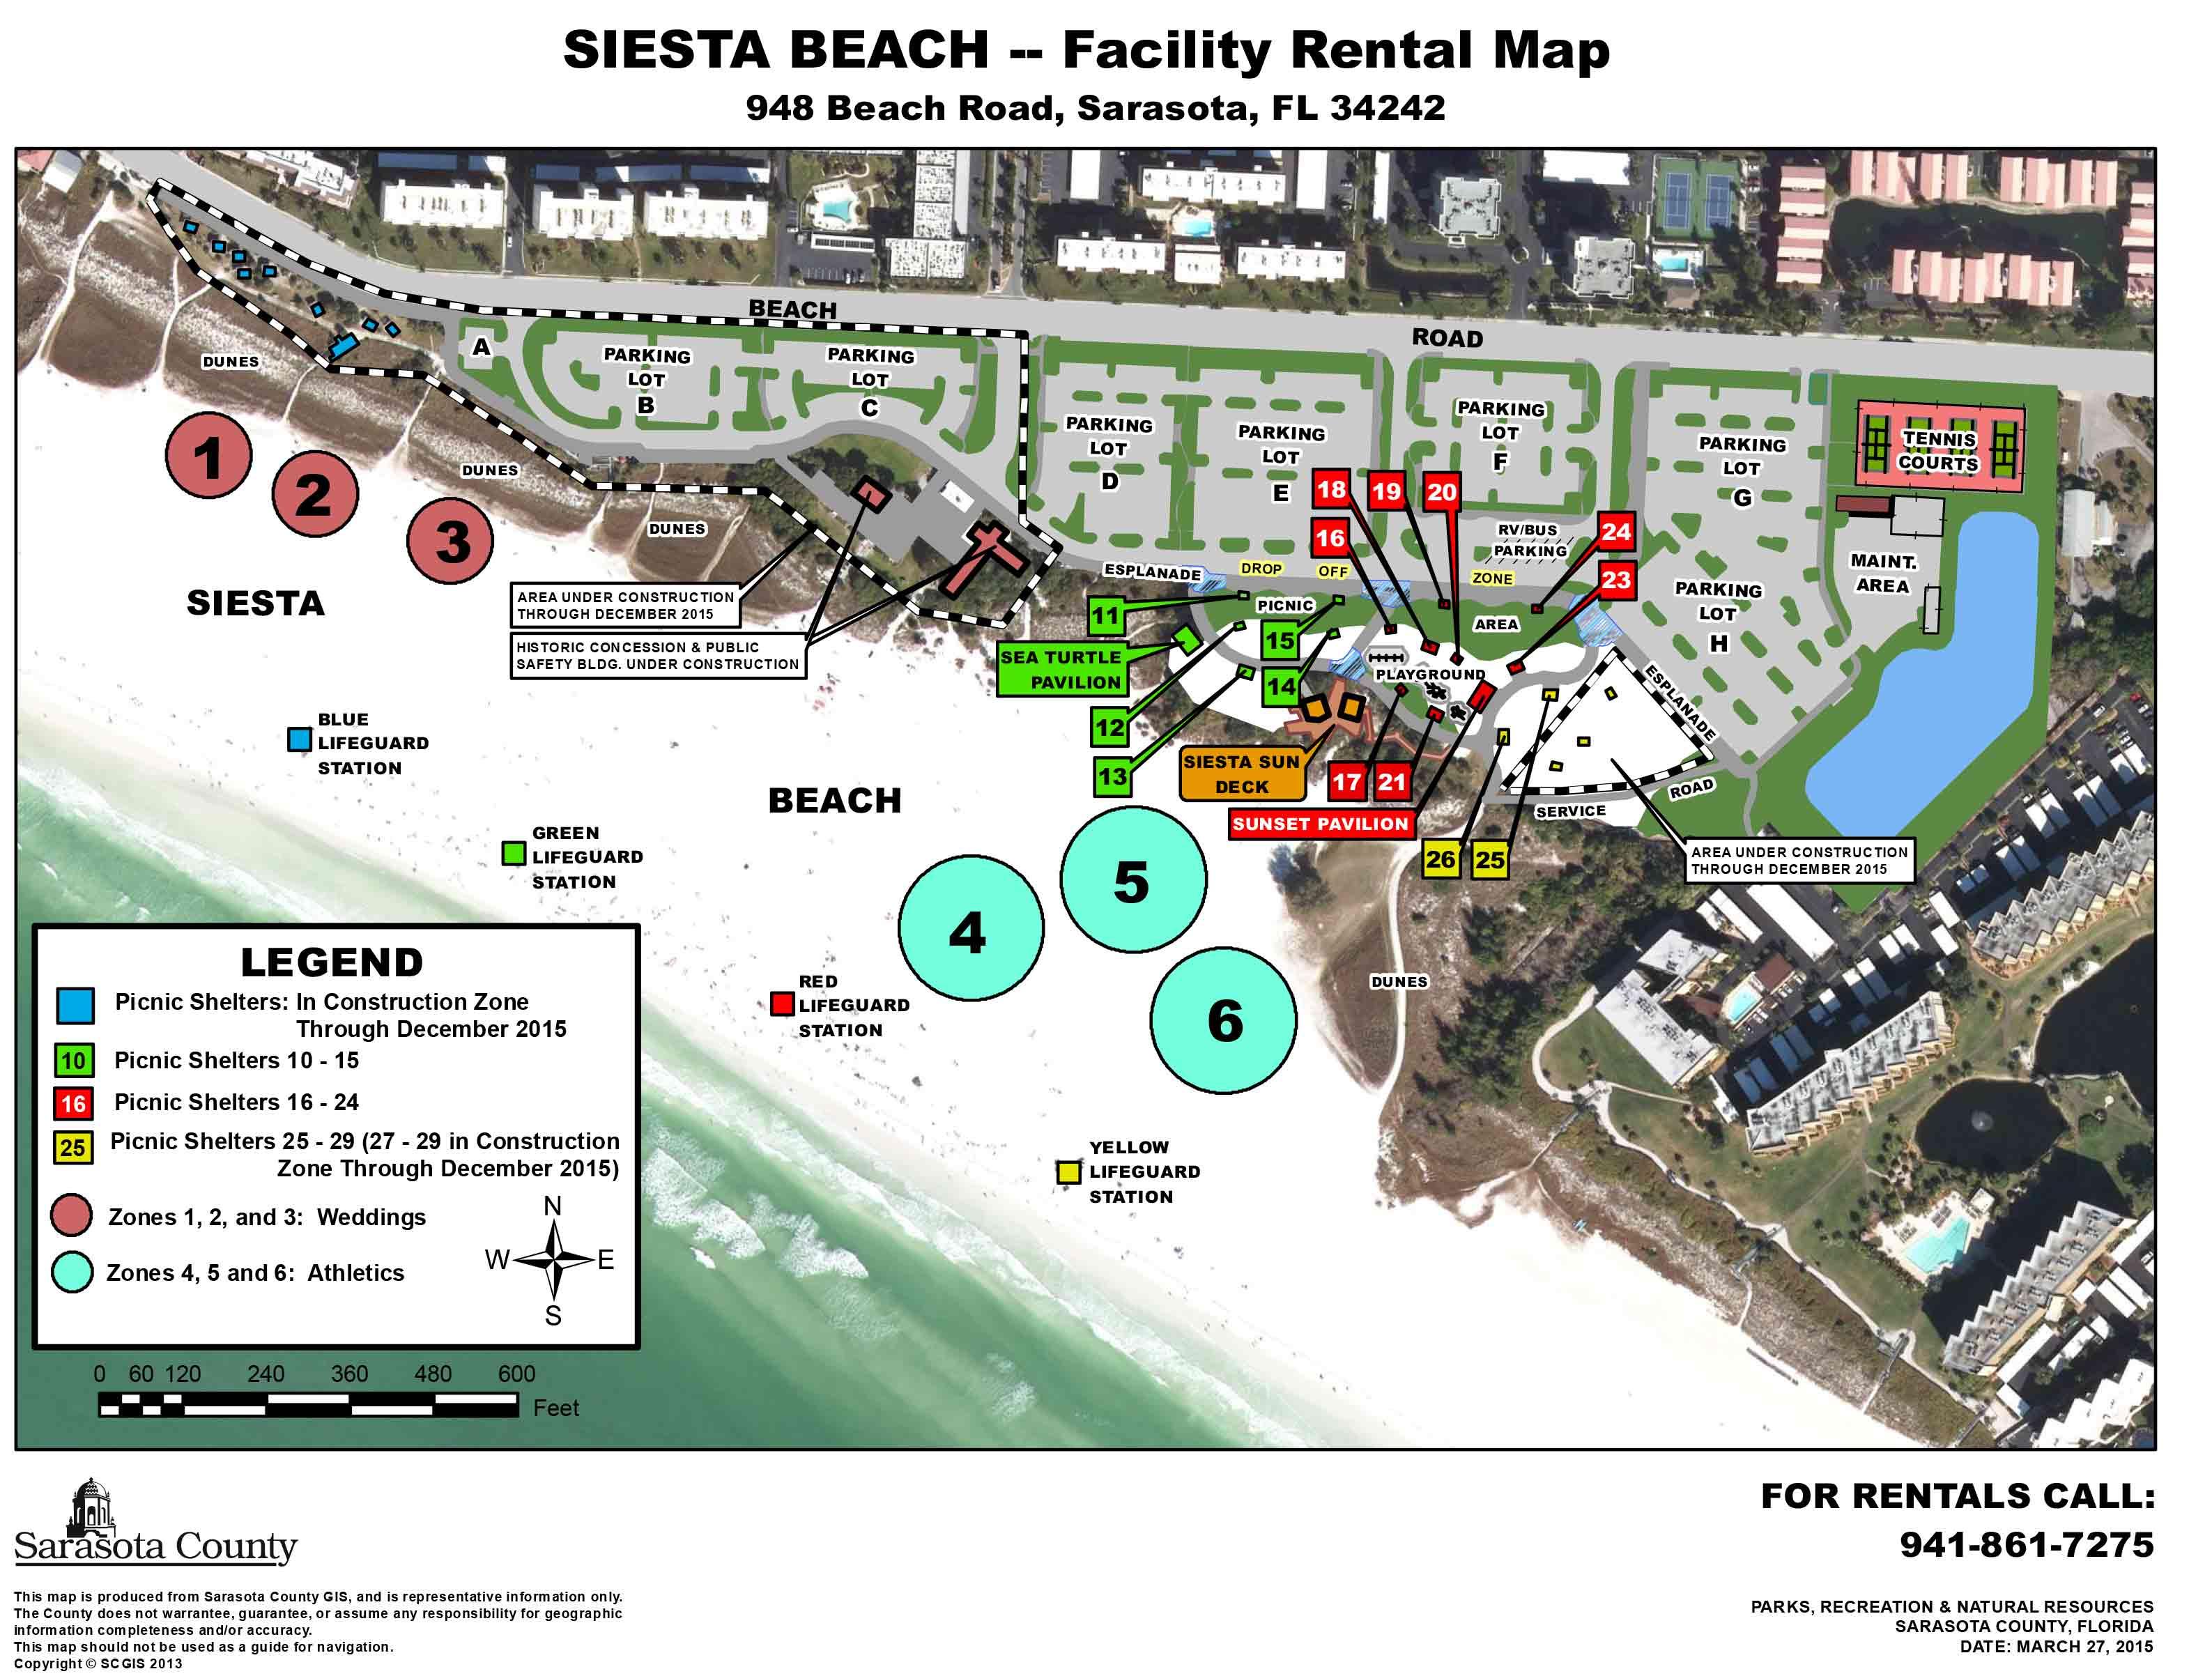 Siesta Key Beach Wedding Location In Sarasota - Siesta Beach Sarasota Florida Map